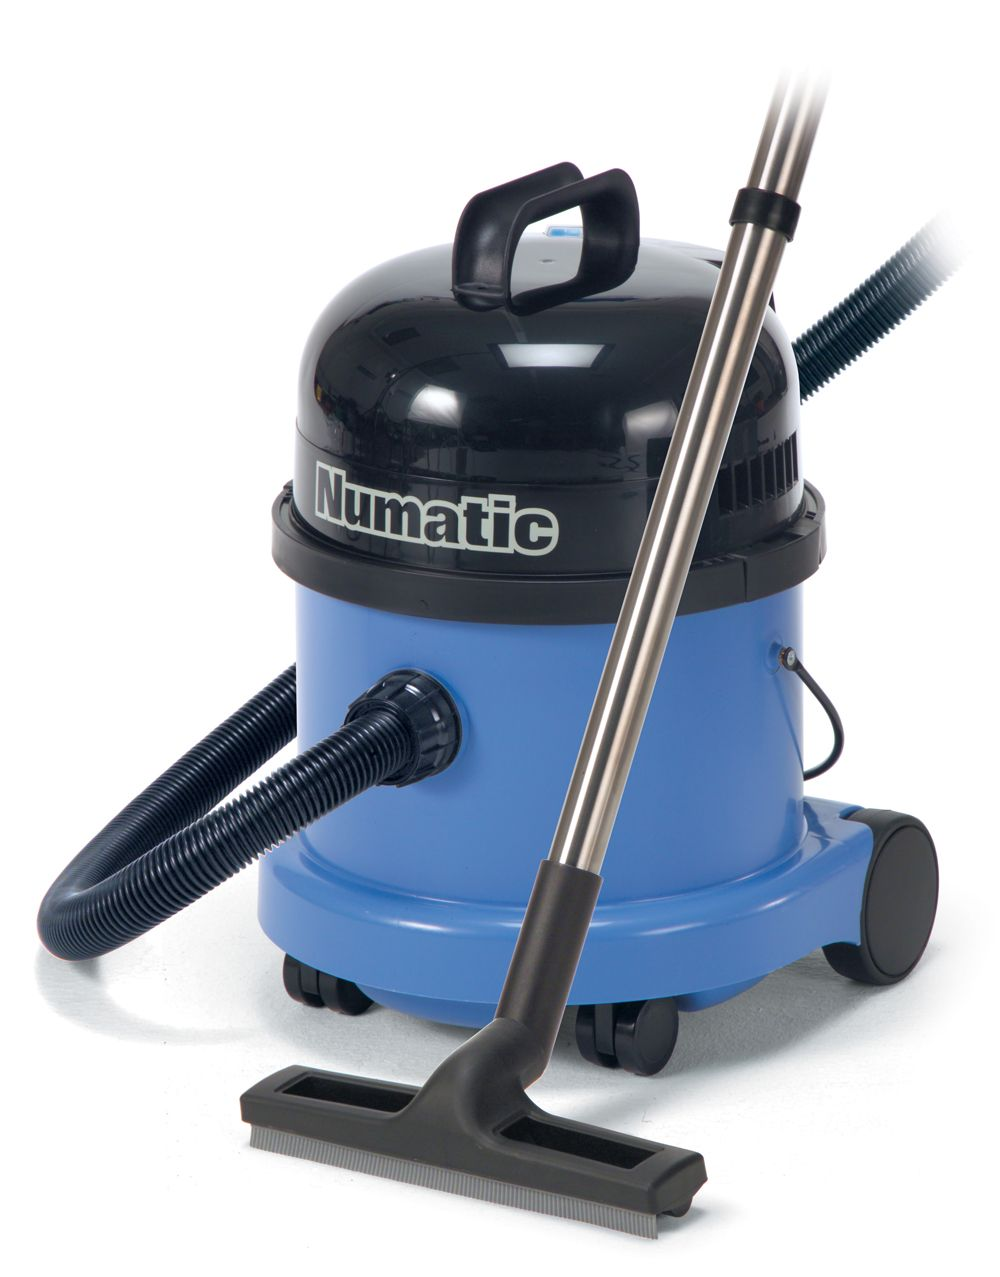 Numatic-WV370-Wet-Dry-Vac-832115